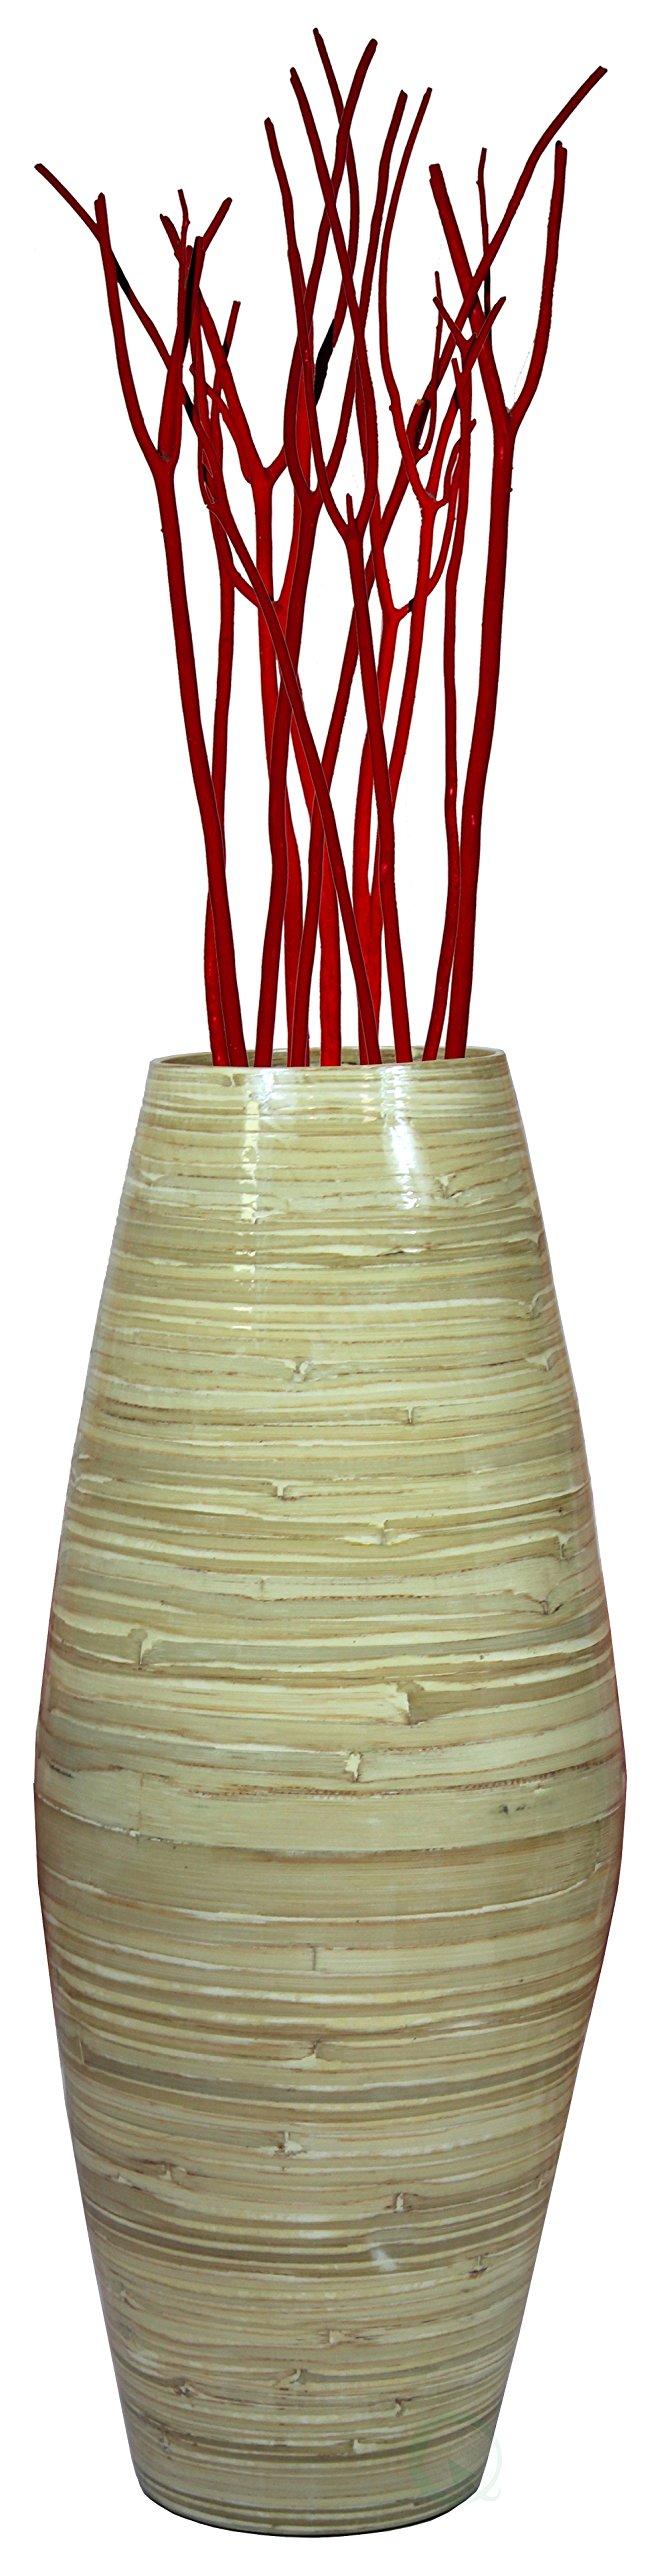 27.5'' Tall Bamboo Floor Vase (Natural)